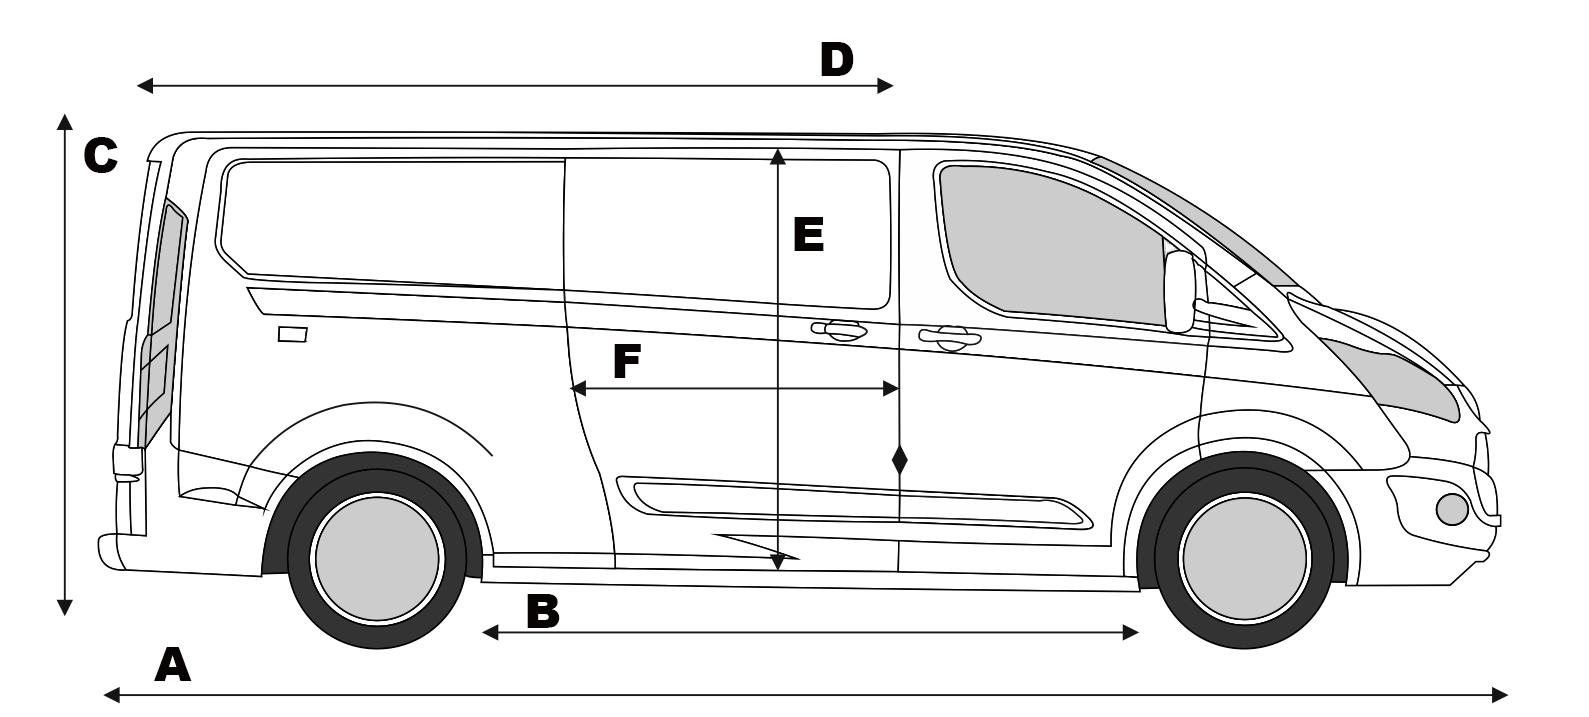 ford transit custom interior dimensions. Black Bedroom Furniture Sets. Home Design Ideas